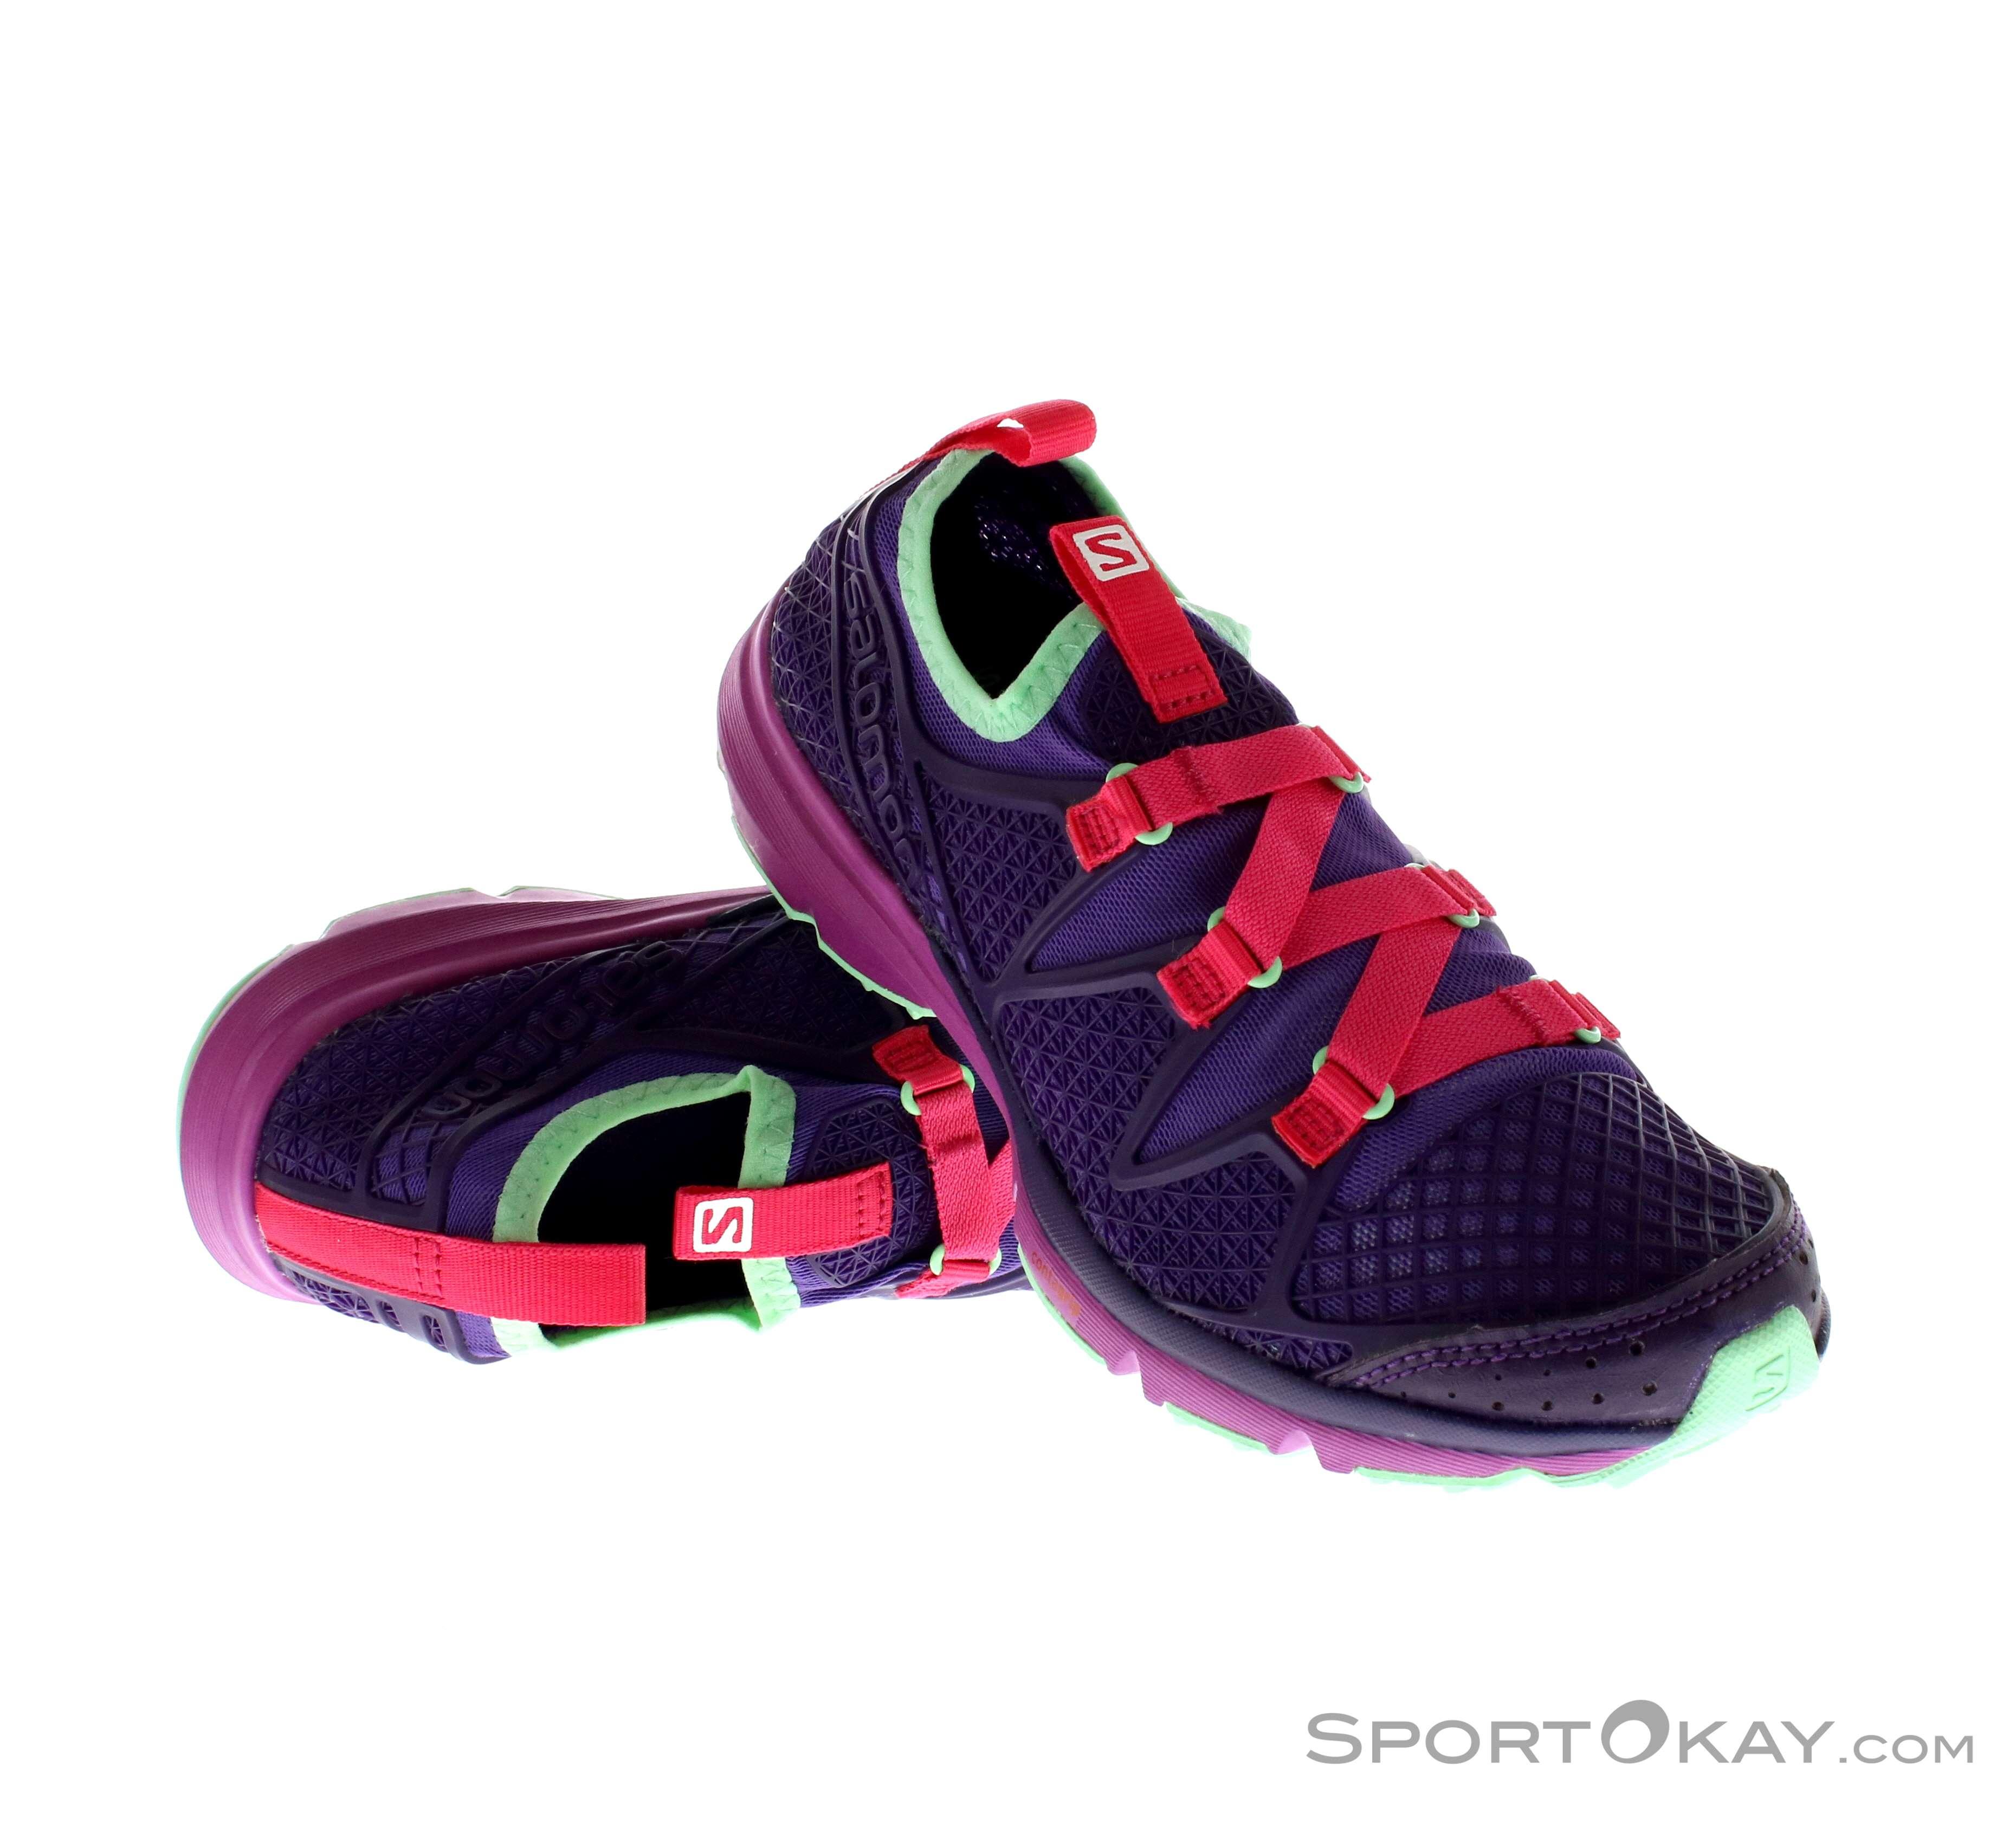 Salomon Salomon Crossamphibian Womens All Round Running Shoes